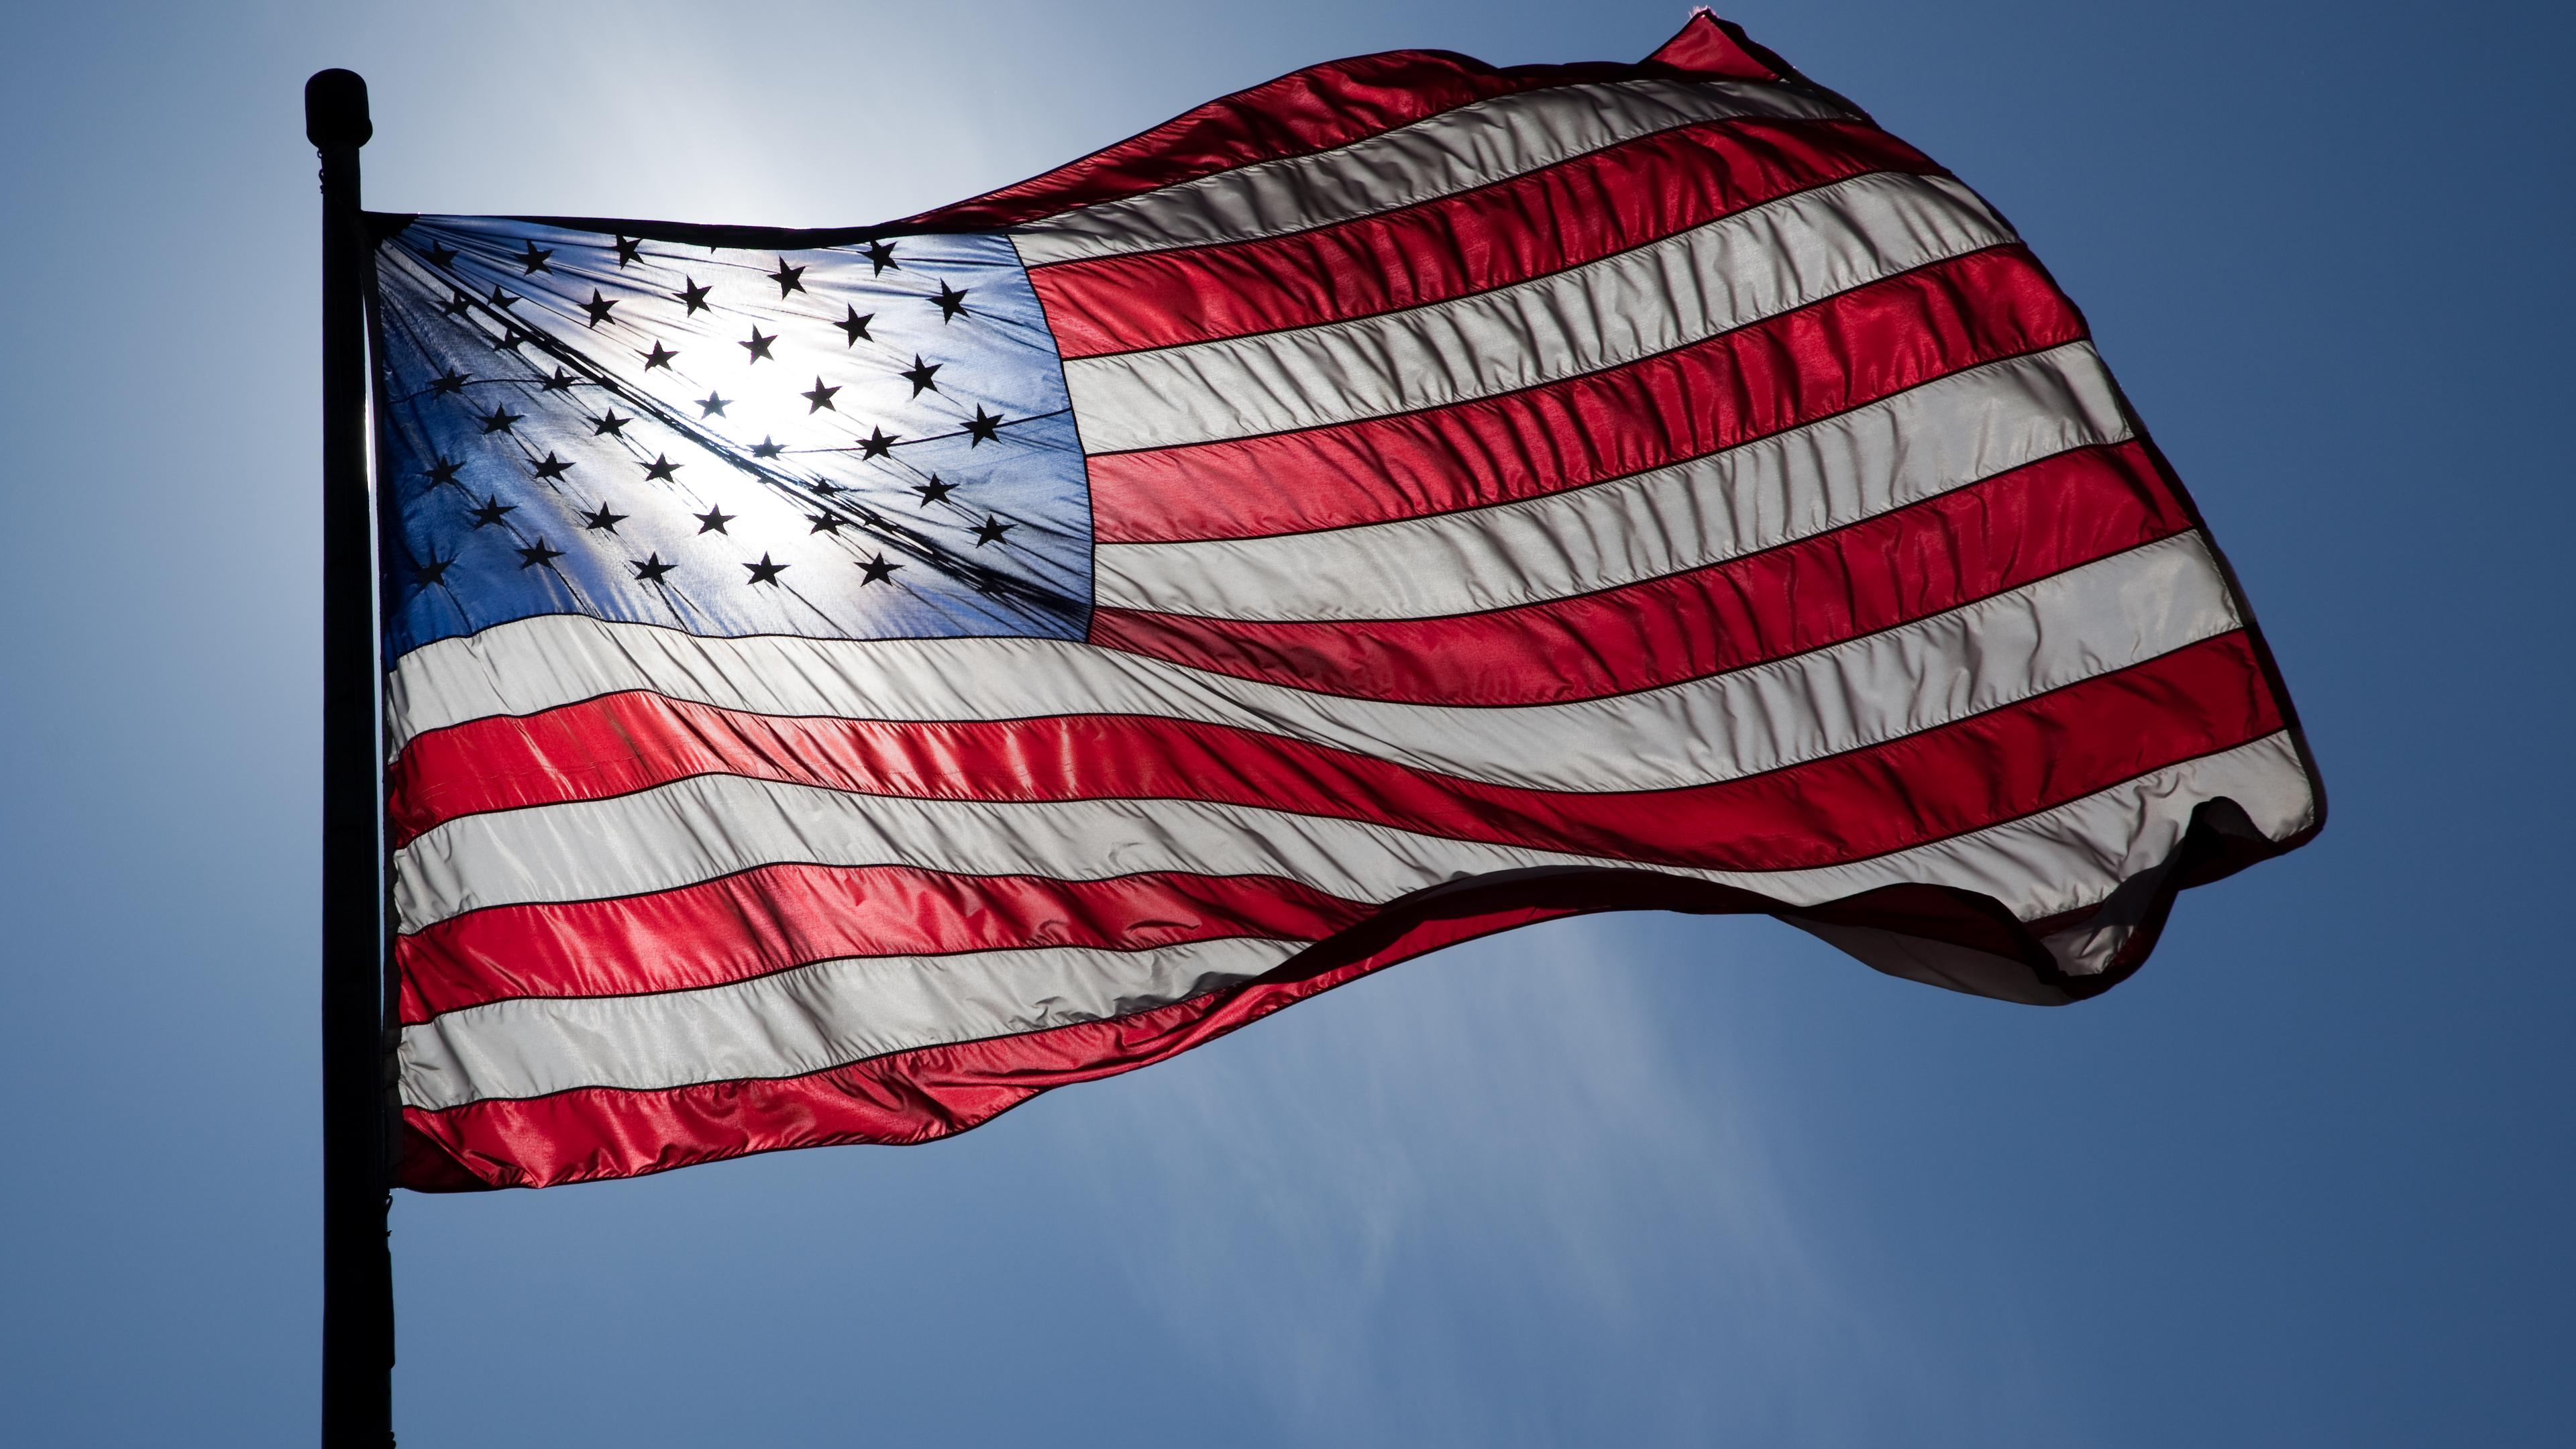 american flag 1538068976 - American Flag - world wallpapers, flag wallpapers, america wallpapers